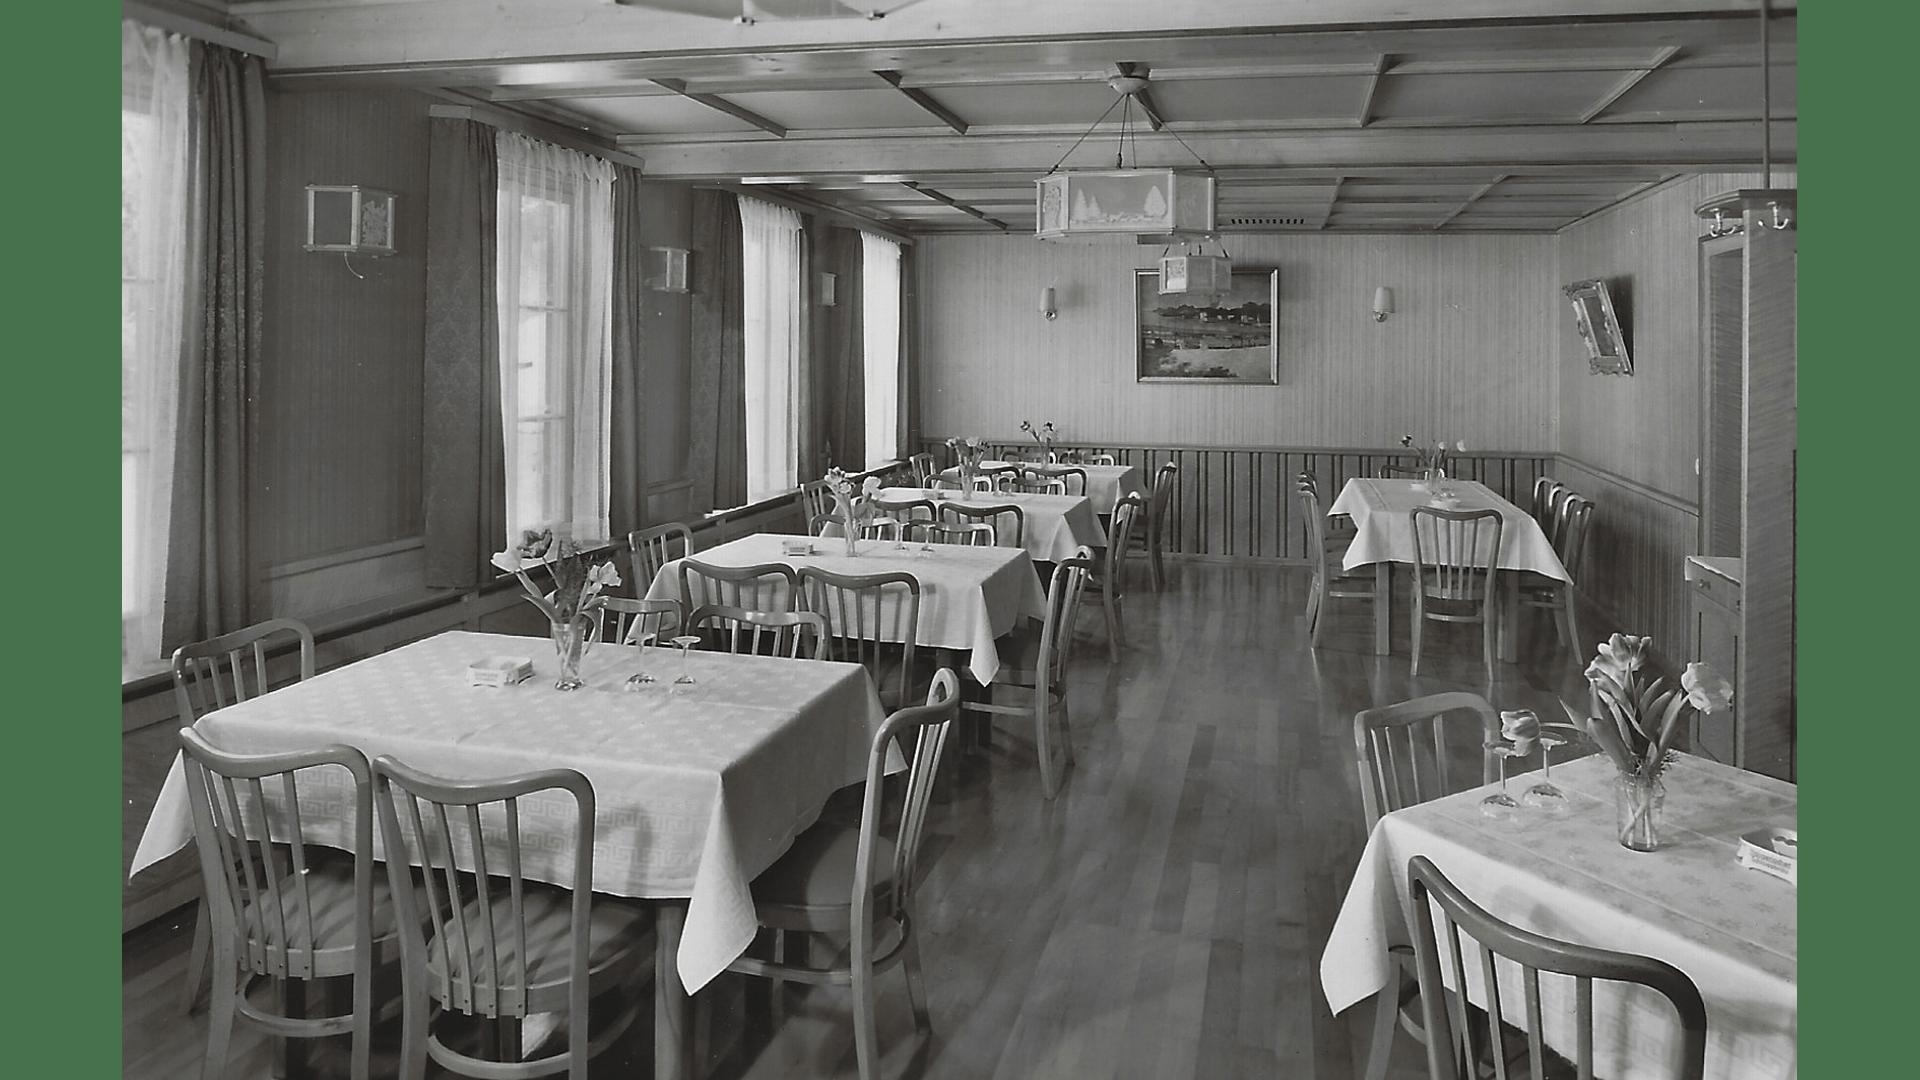 Schickhardtstube, ab 1964 Hauskapelle; Foto:  Archiv Arme Schulschwestern